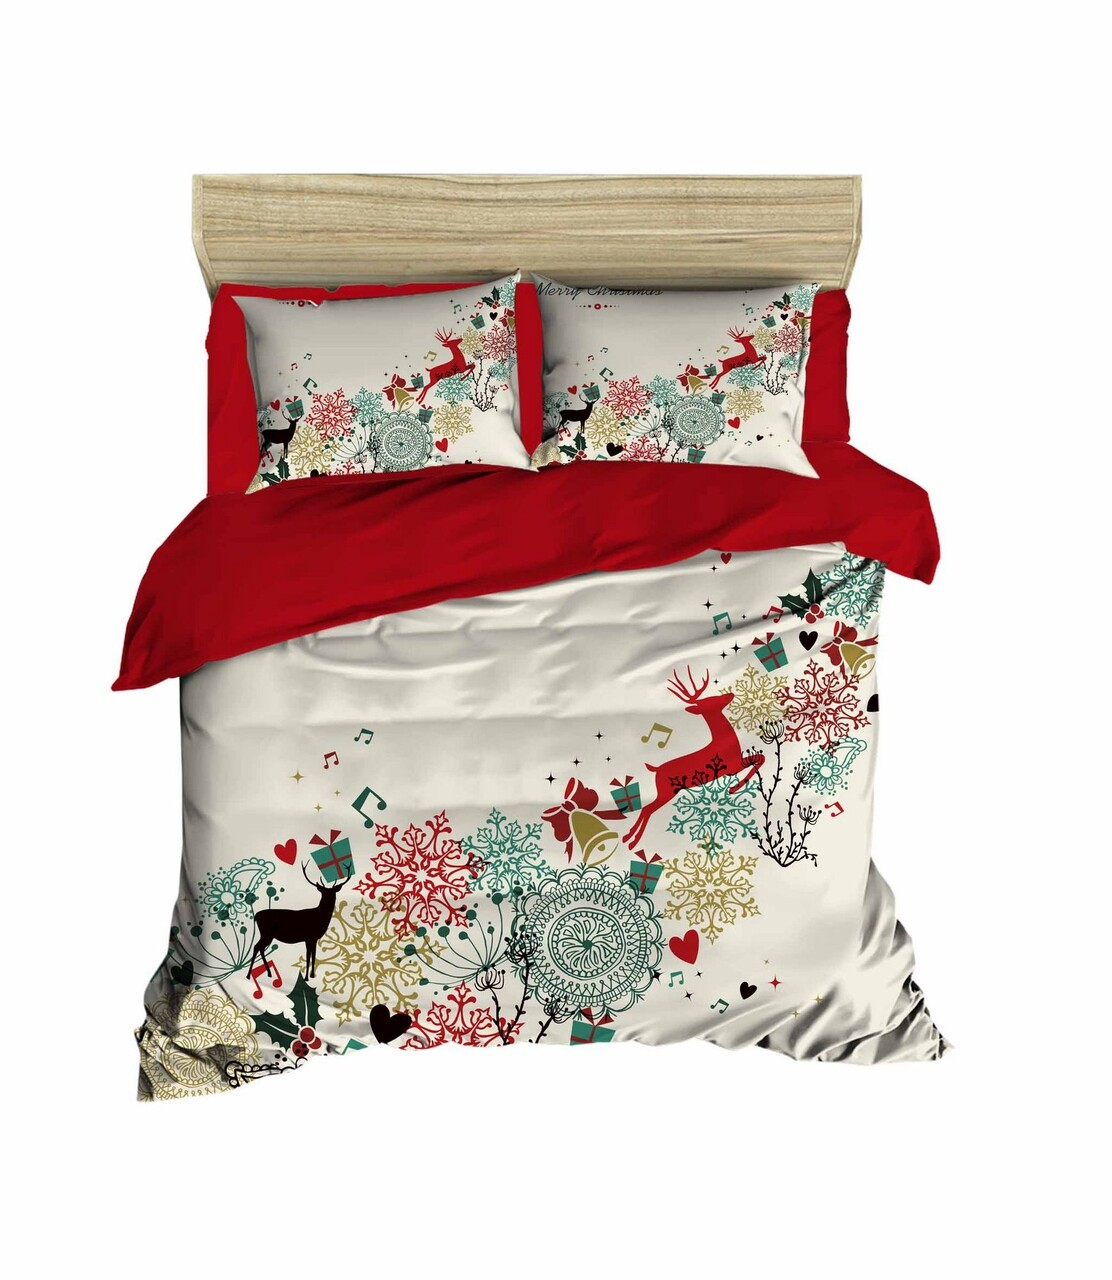 Lenjerie de pat pentru doua persoane, Pearl Home, 451, print 3D, policoton, 4 piese, rosu/alb/verde